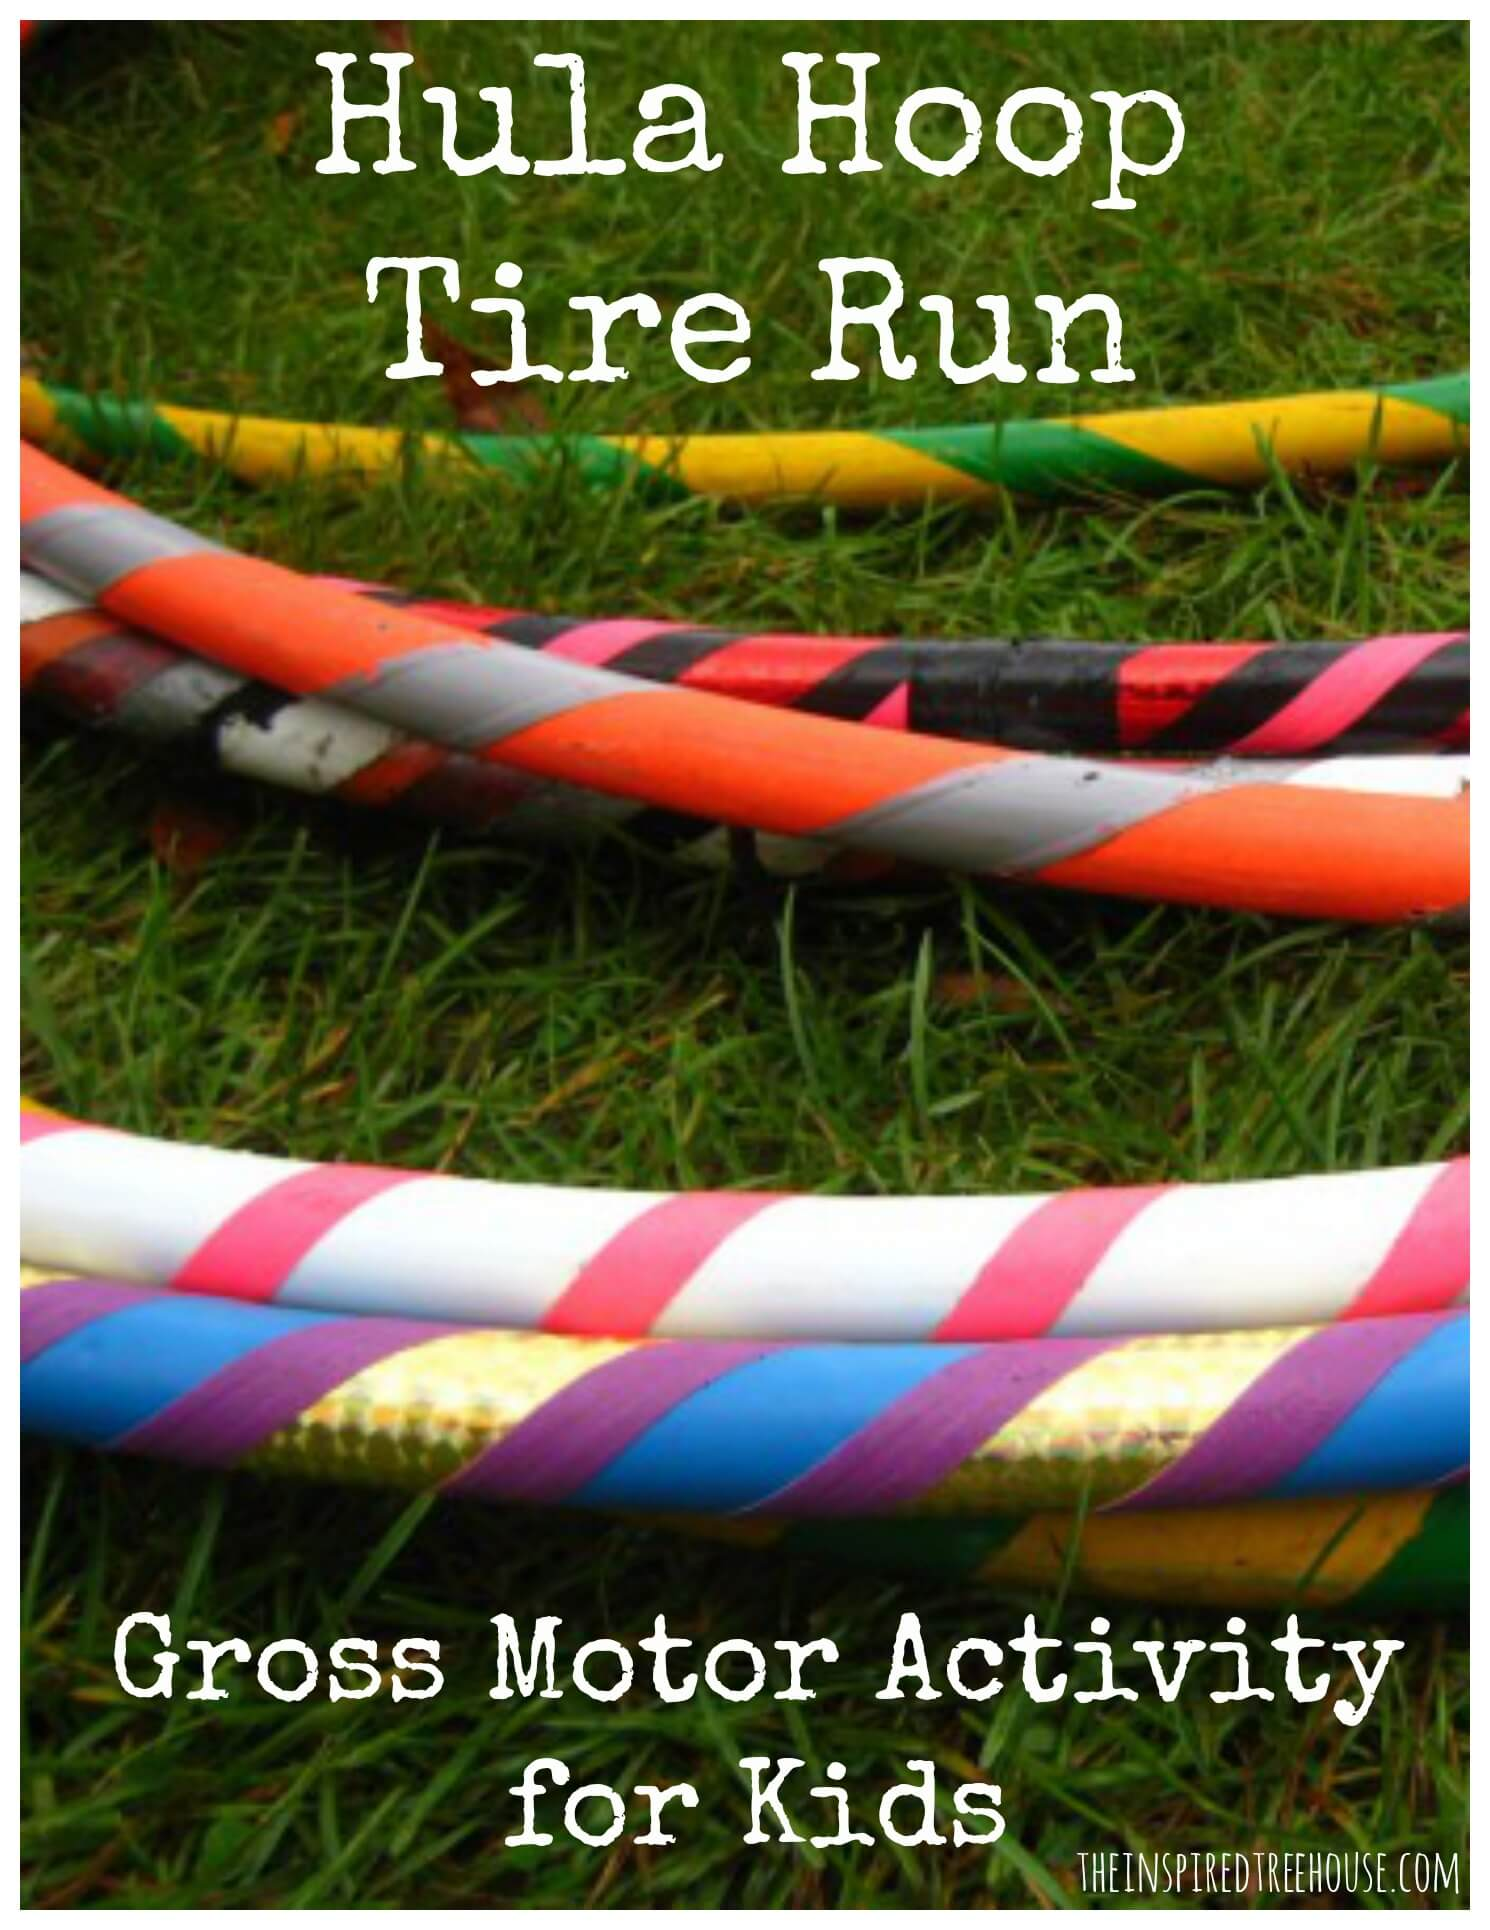 Tire run the hula hoop gross motor activity for Christmas gross motor activities